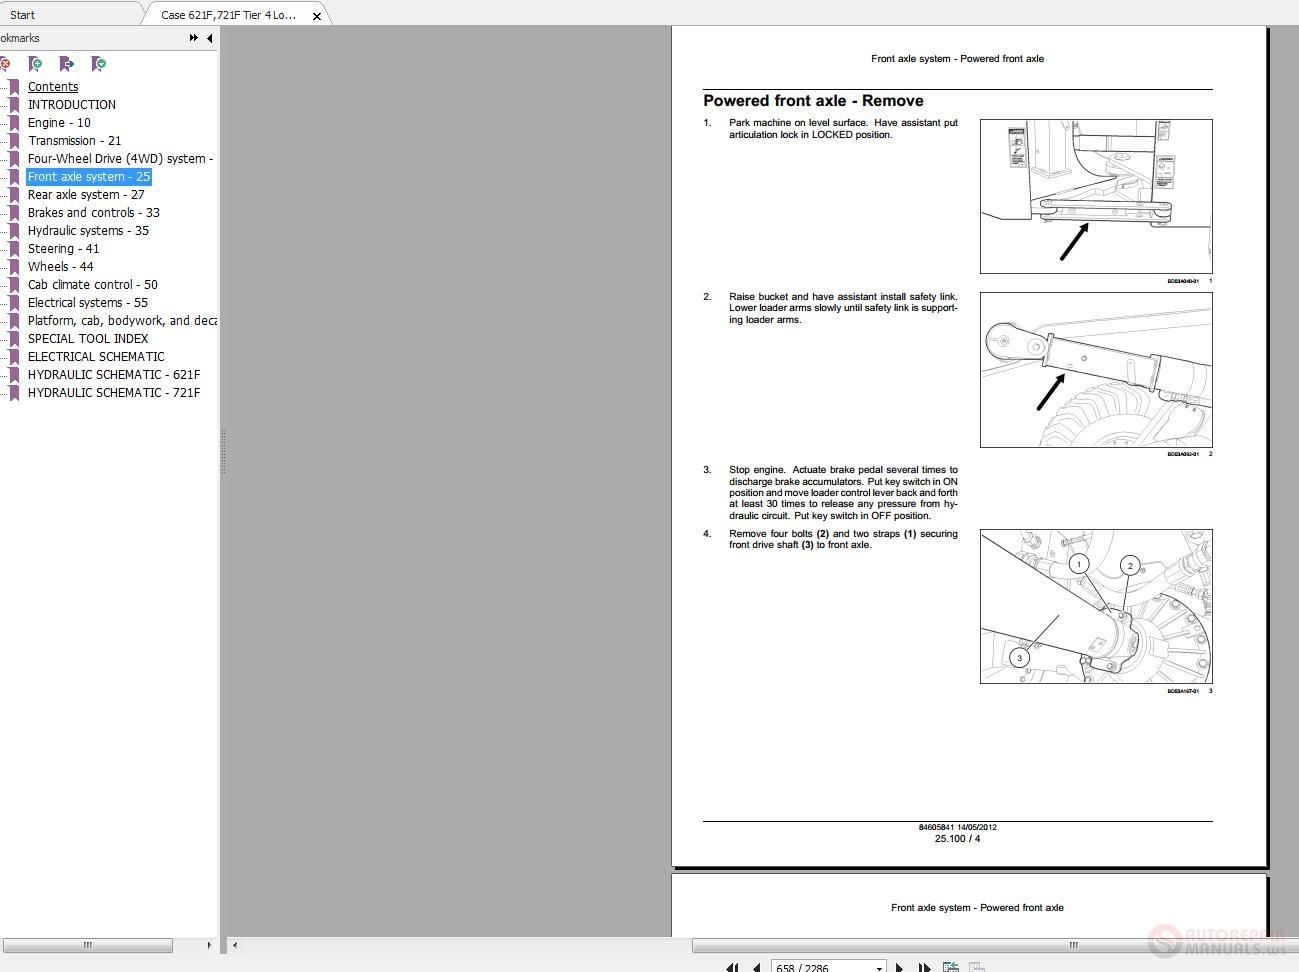 Manualguide 2006 Jeep Wrangler Wiring Diagram Hesston Manual Ebook Rh Geologix Solutions